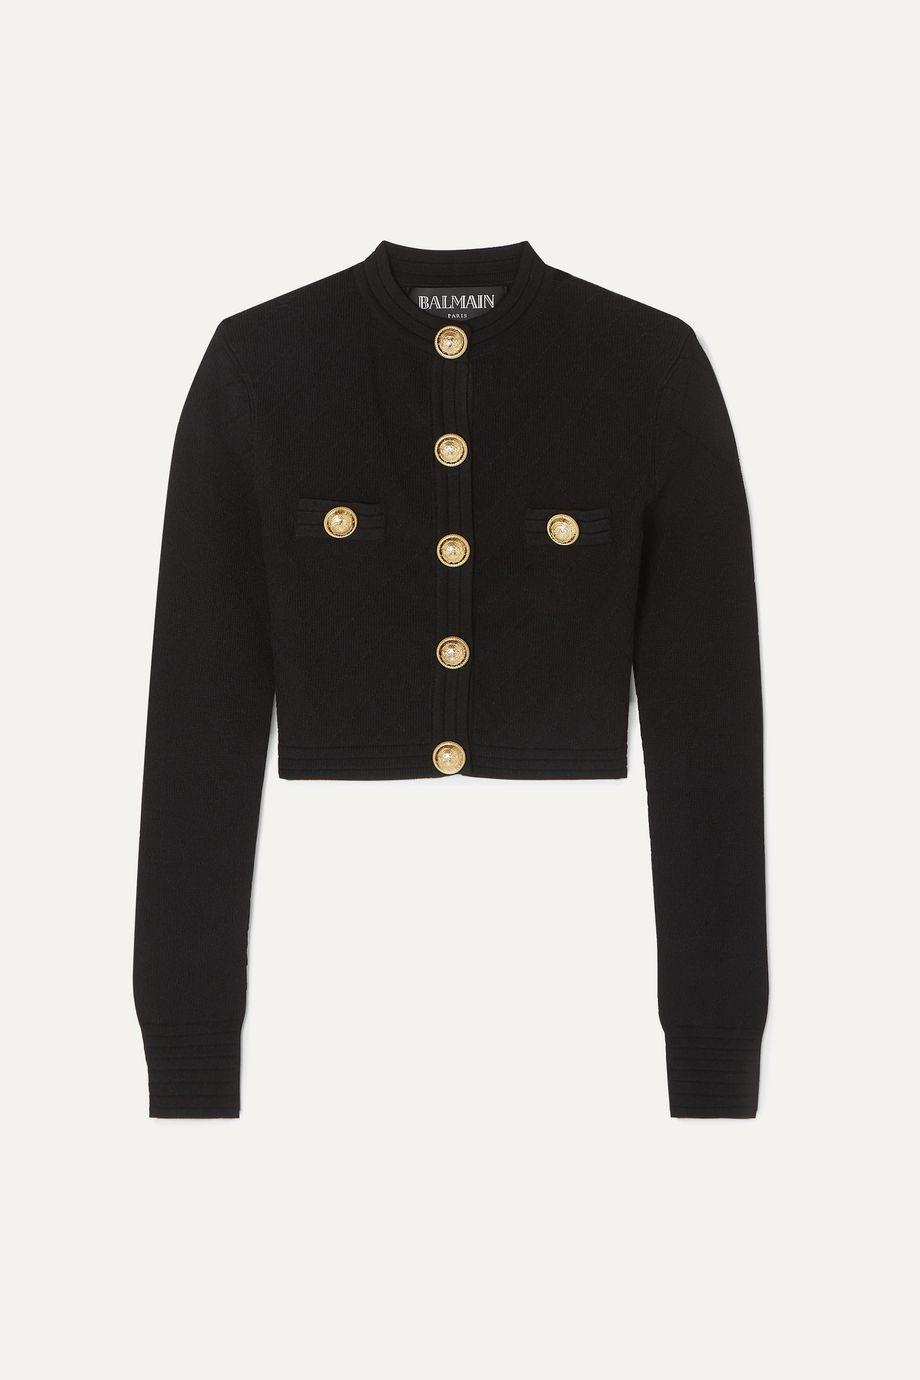 Balmain Button-embellished jacquard-knit cardigan